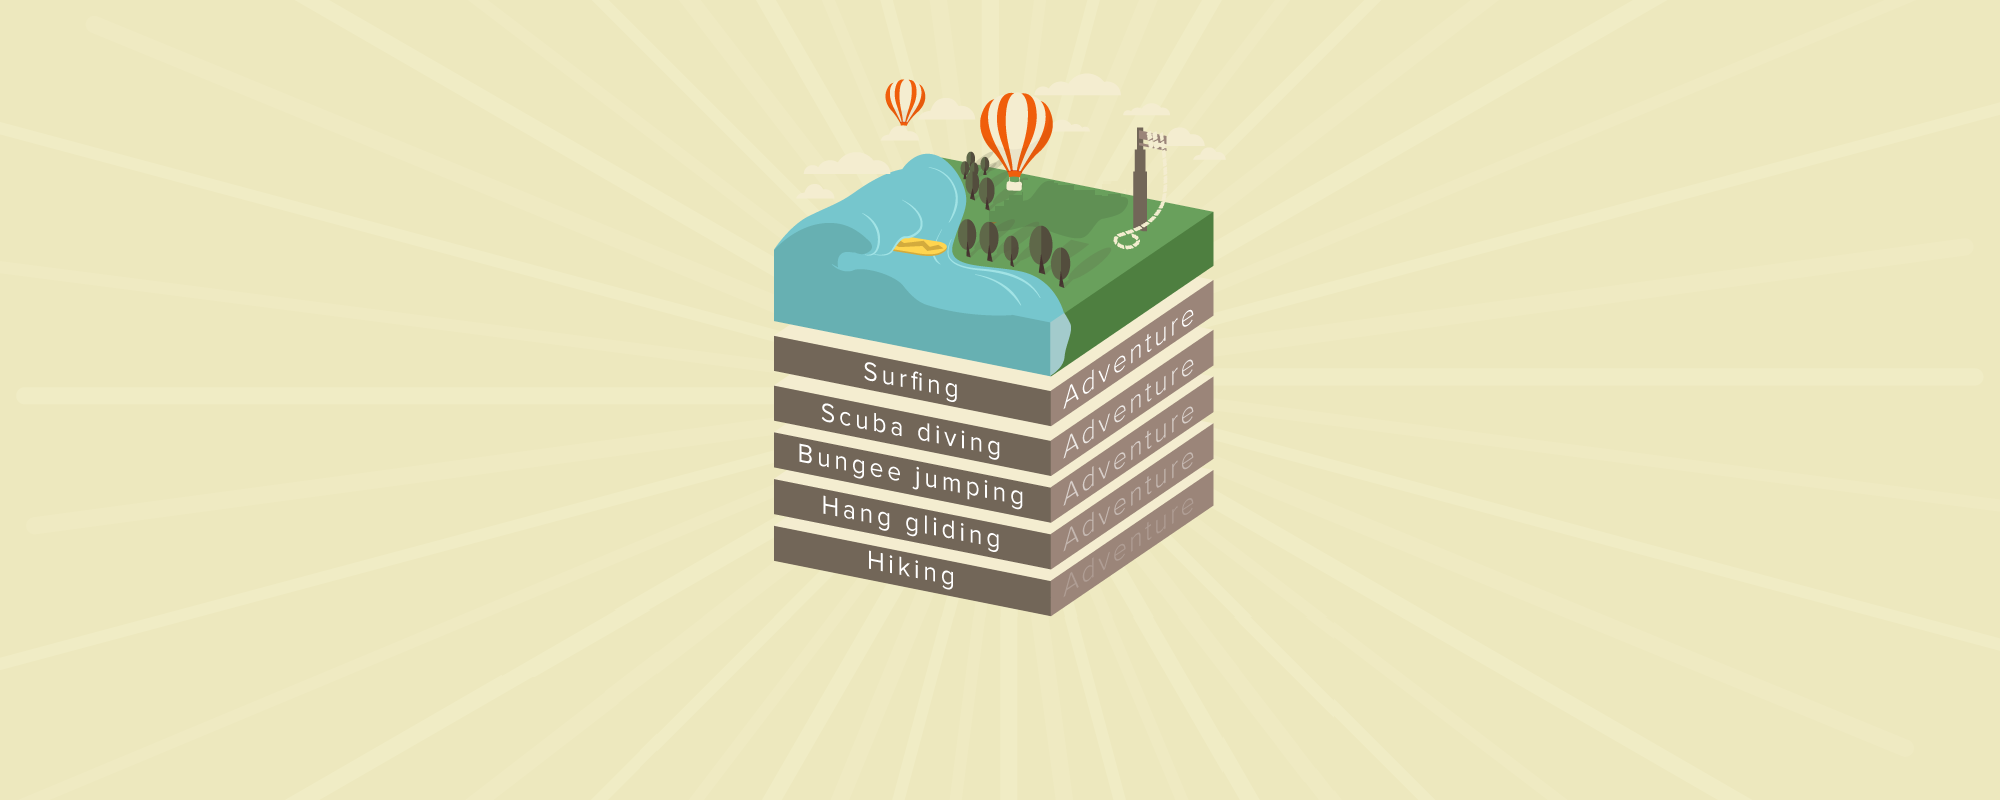 Build Adventure Activities Booking Platform with Advanced Script Features